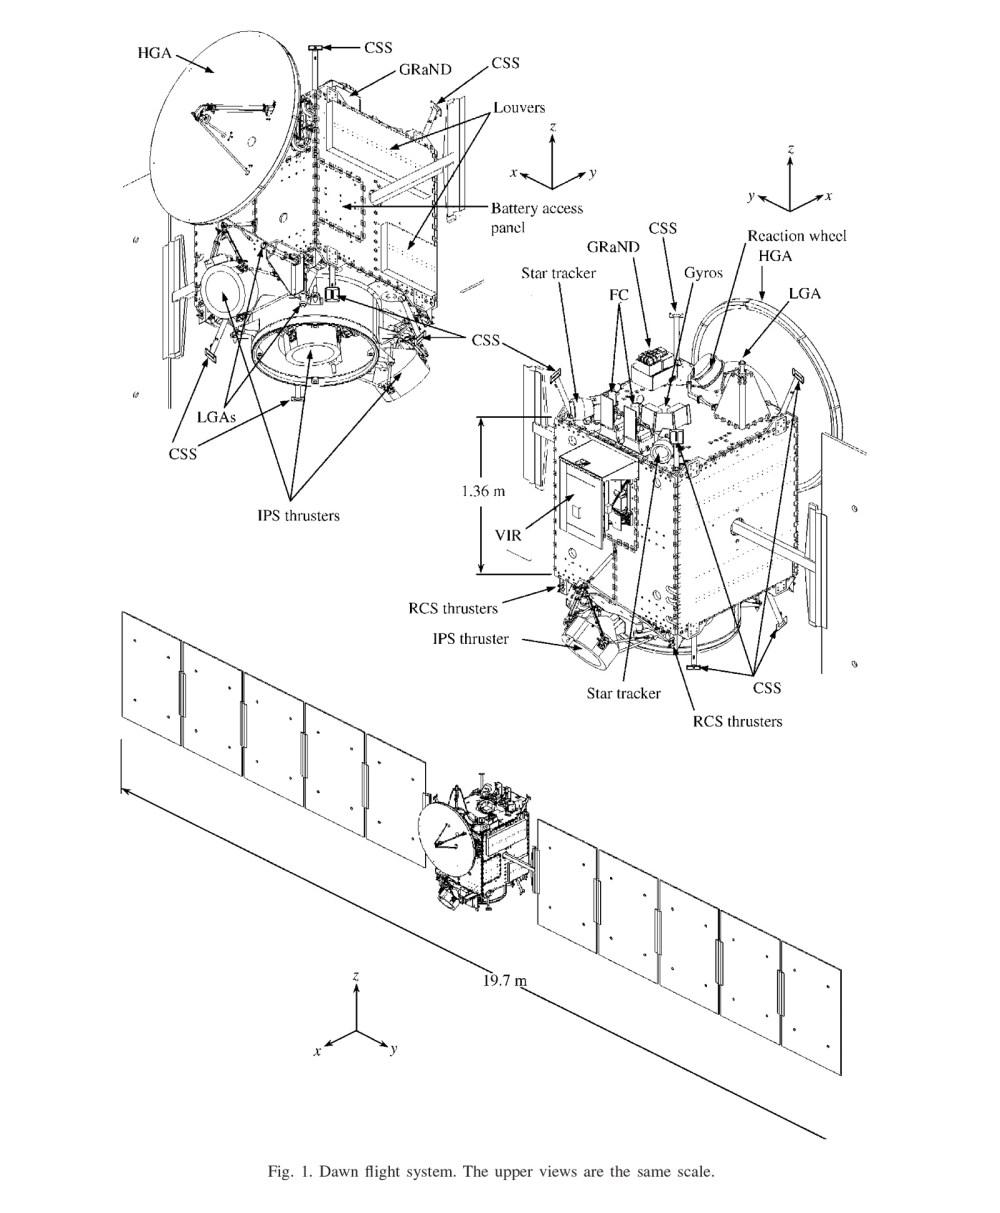 medium resolution of 1600x1942 dawn spacecraft diagram no solar system exploration nasa science solar system line drawing